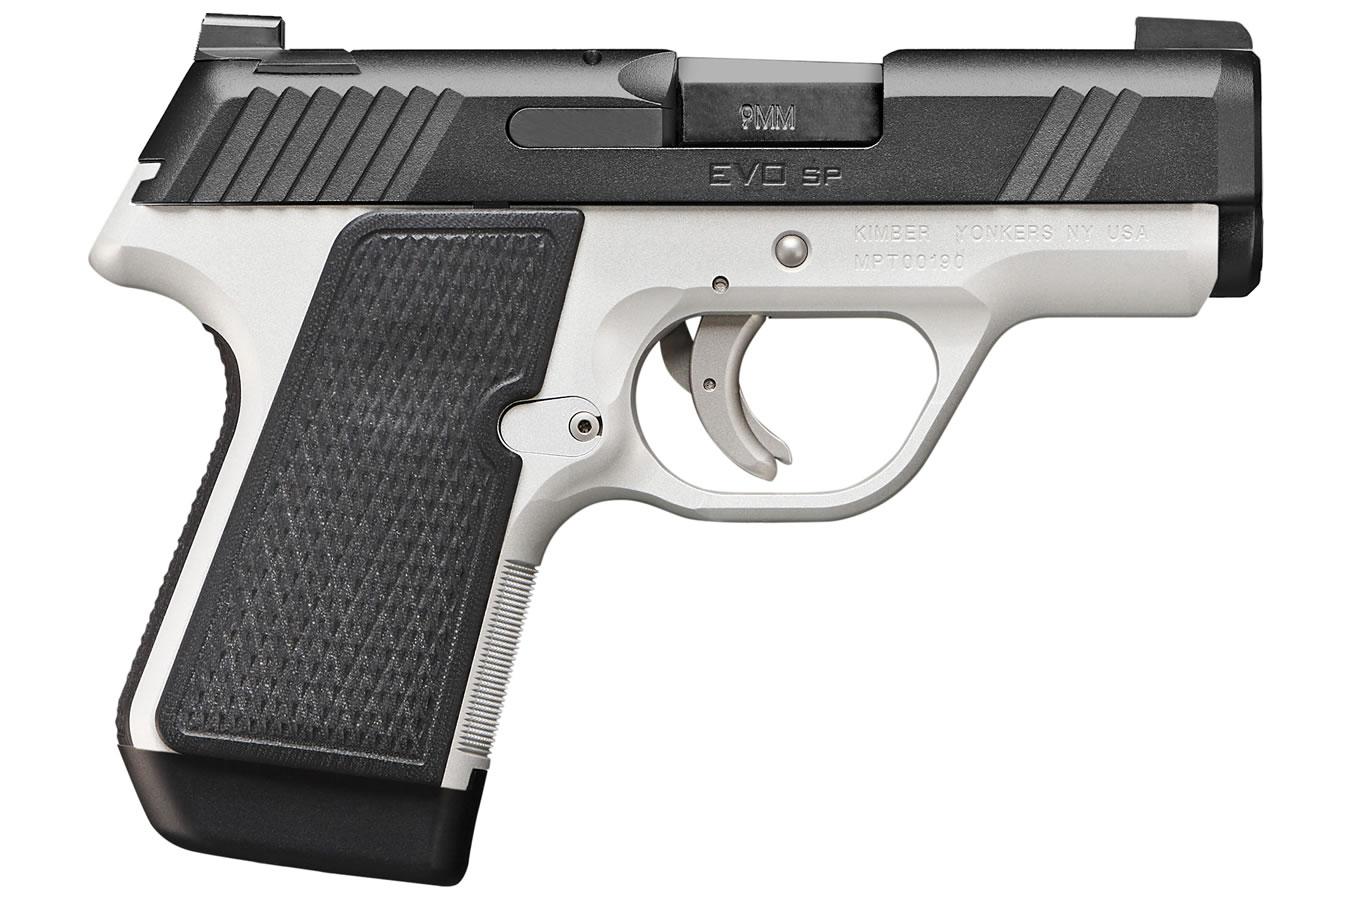 Kimber EVO SP Two Tone 9mm · 3900010 · DK Firearms